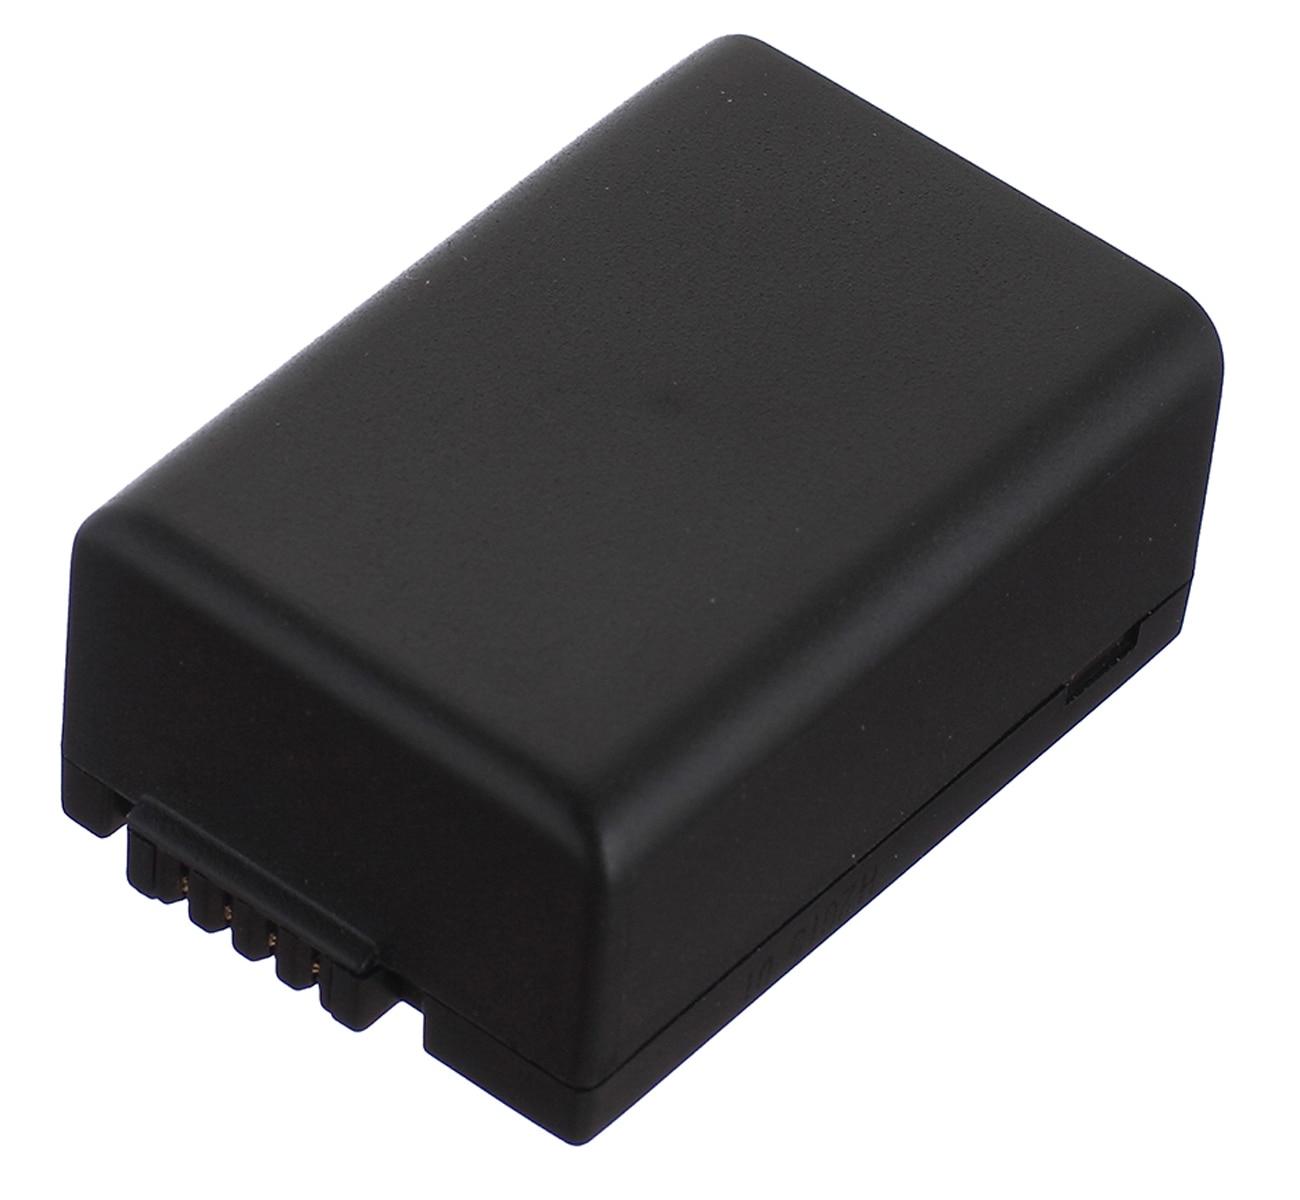 Battery Pack For Panasonic Lumix DMC-FZ40, FZ45, FZ47,FZ48,FZ60,FZ62,FZ70,FZ72,DC-FZ80,FZ81,FZ82,FZ83,FZ100,FZ150 Digital Camera